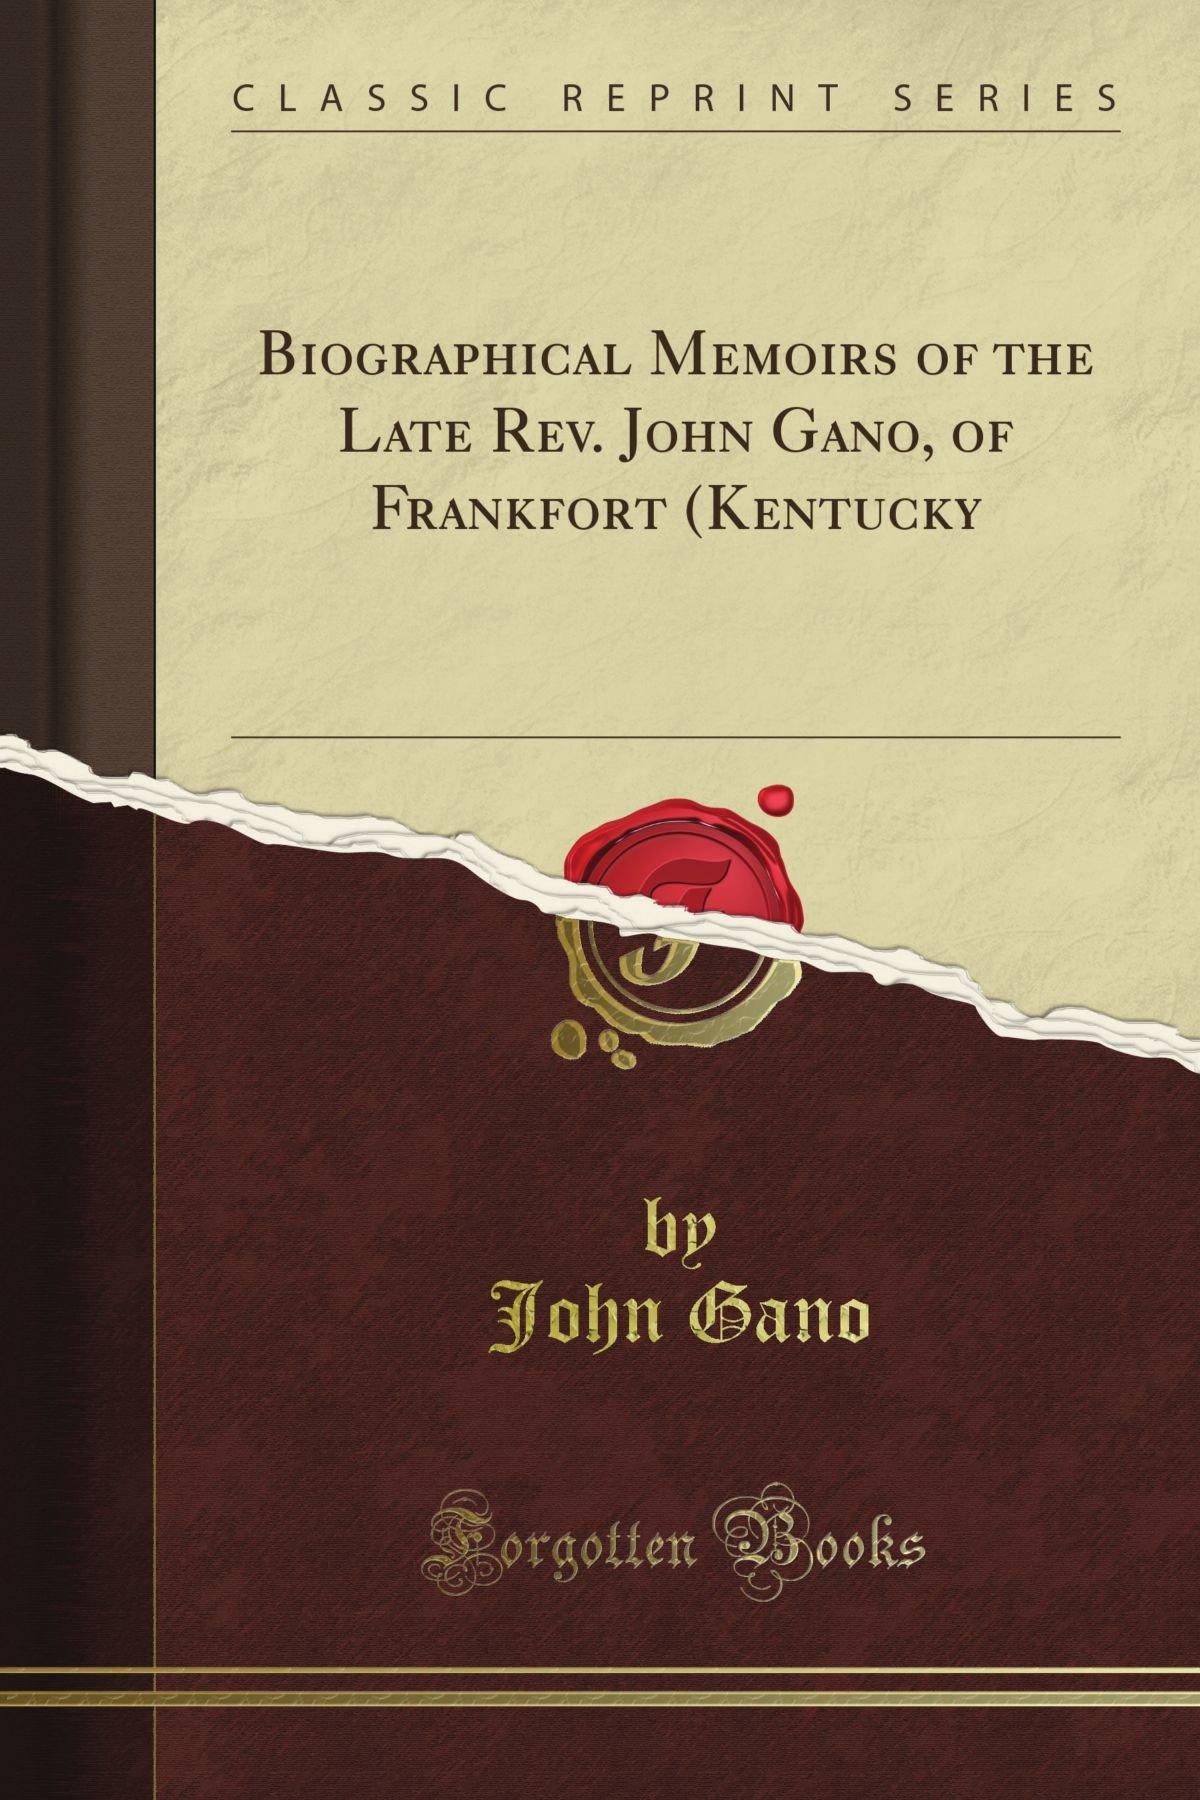 Biographical Memoirs of the Late Rev. John Gano, of Frankfort (Kentucky (Classic Reprint) PDF